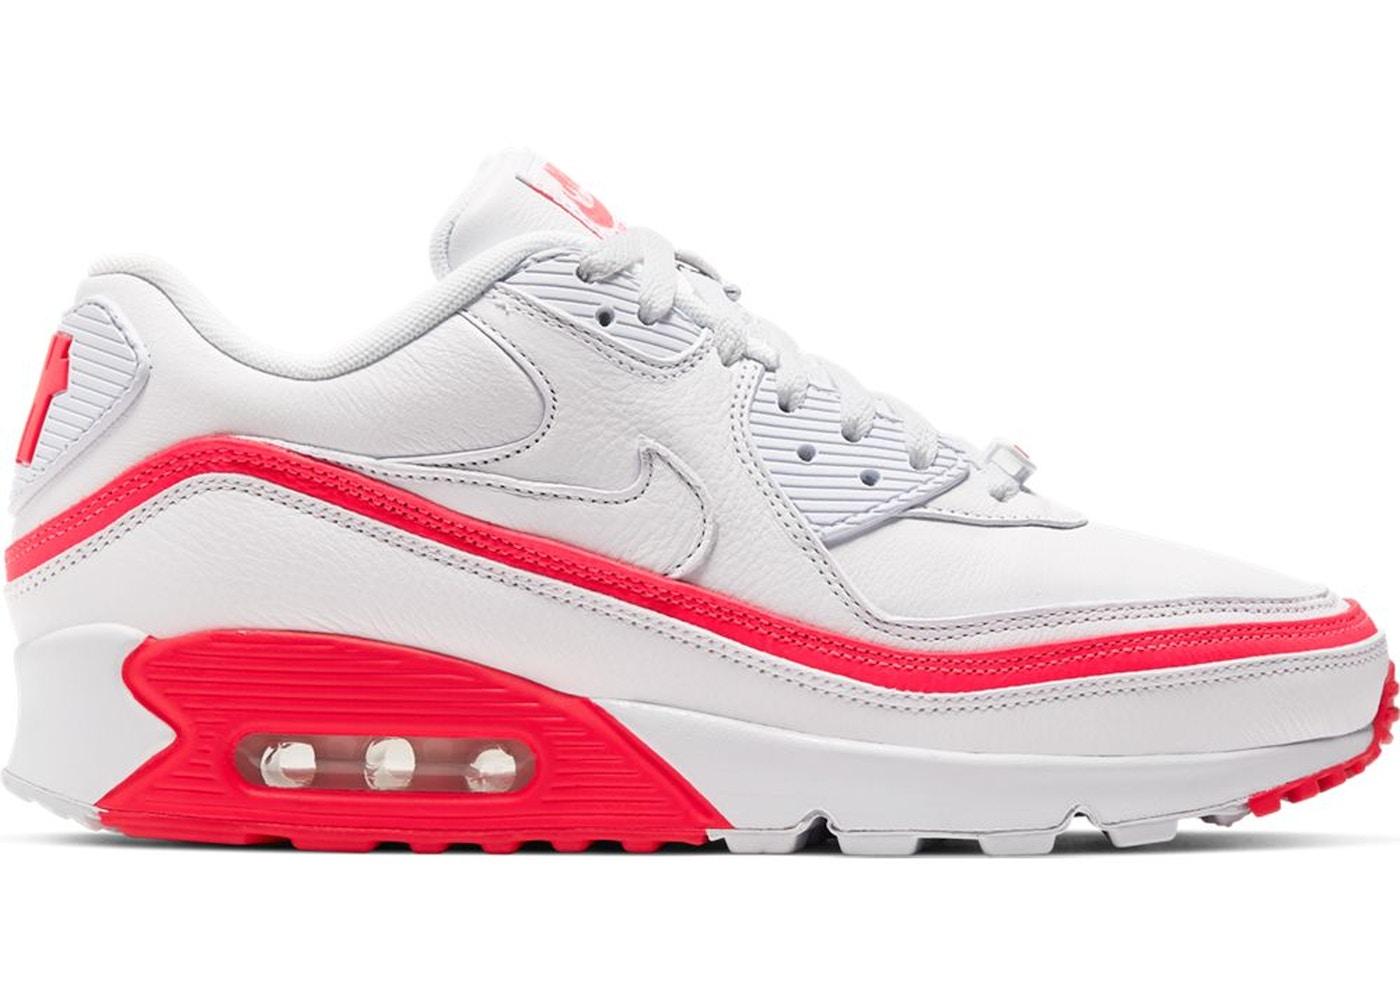 Nike Air Jordan 5 Schuhe Kinder 849